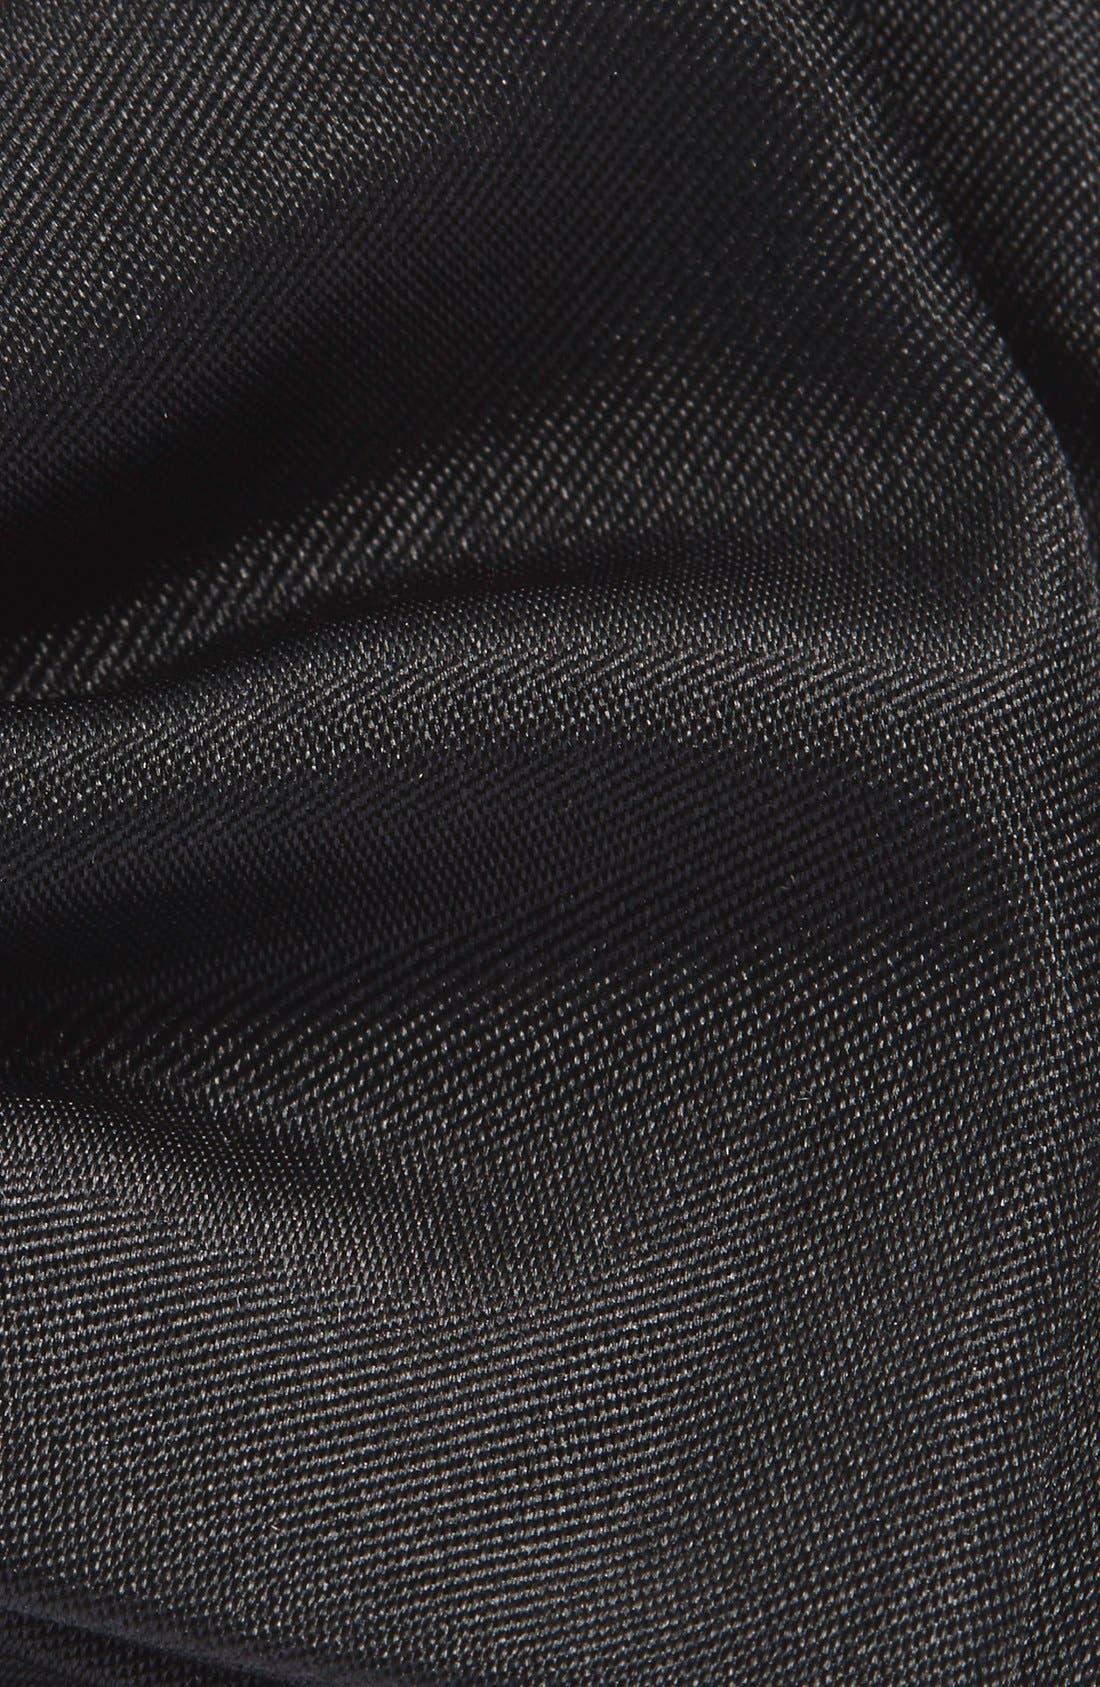 Silk Pre-Tied Bow Tie,                             Alternate thumbnail 2, color,                             BLACK